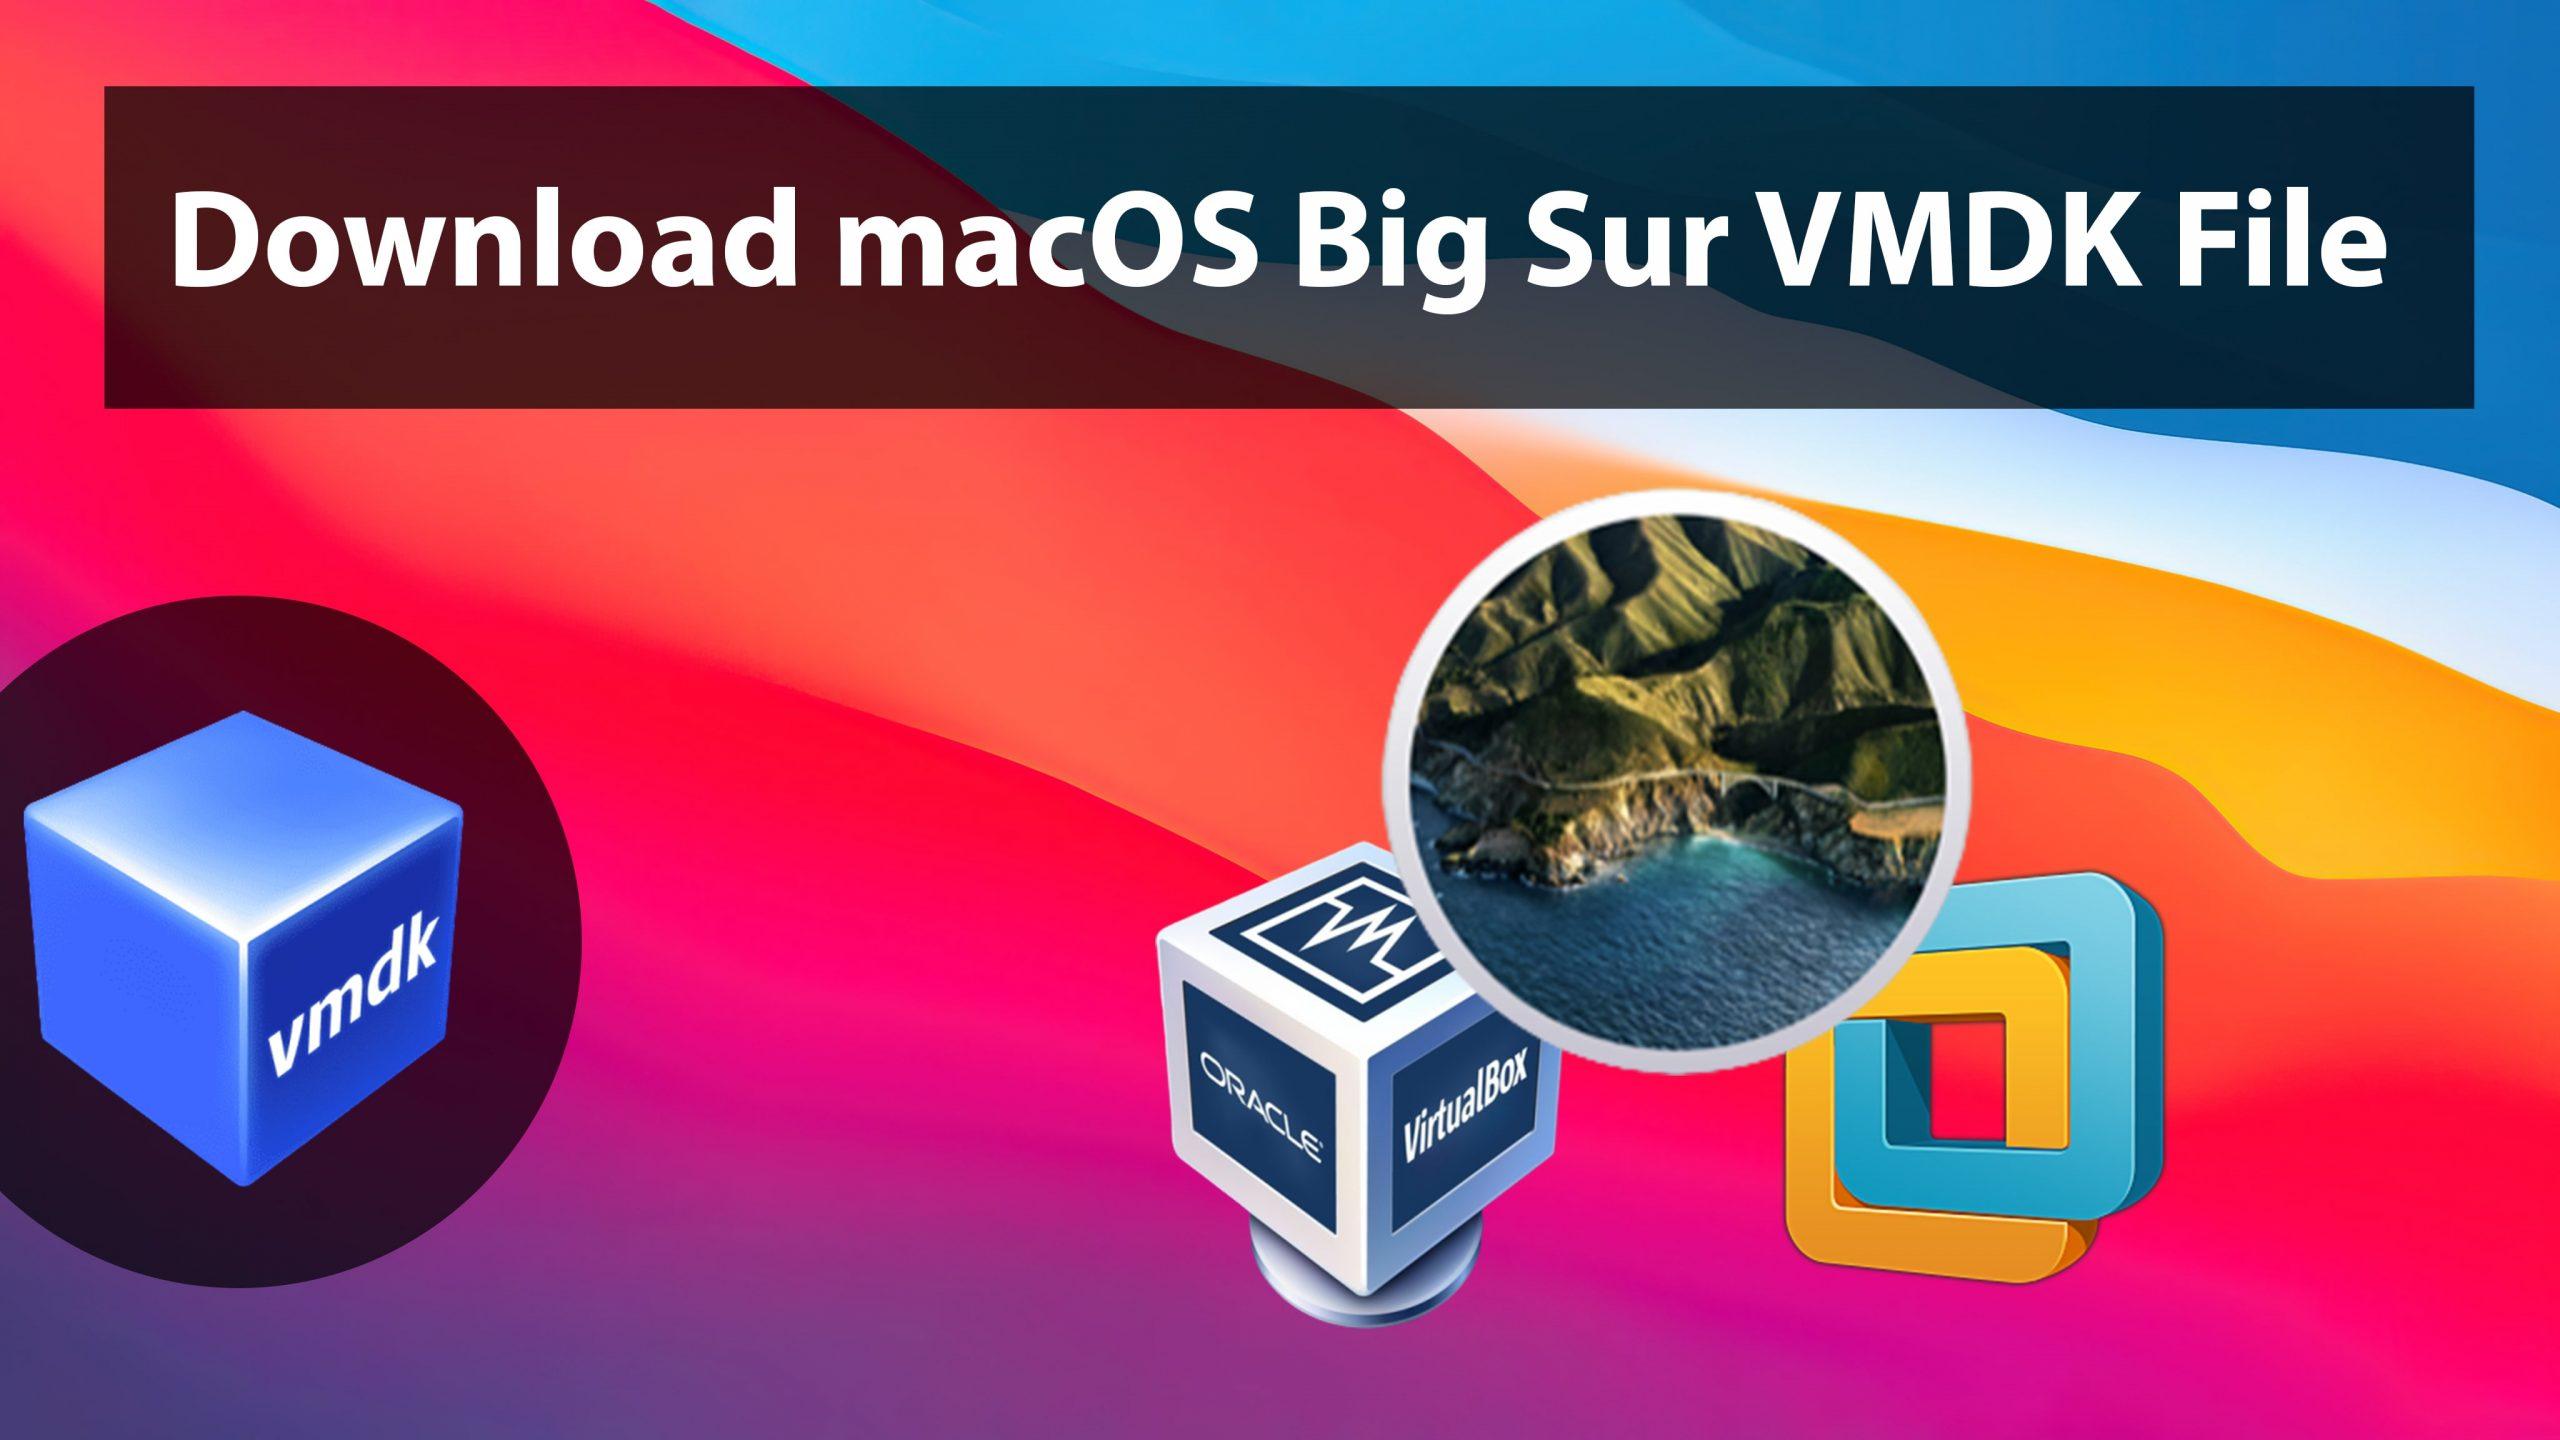 Download macOS Big Sur VMDK